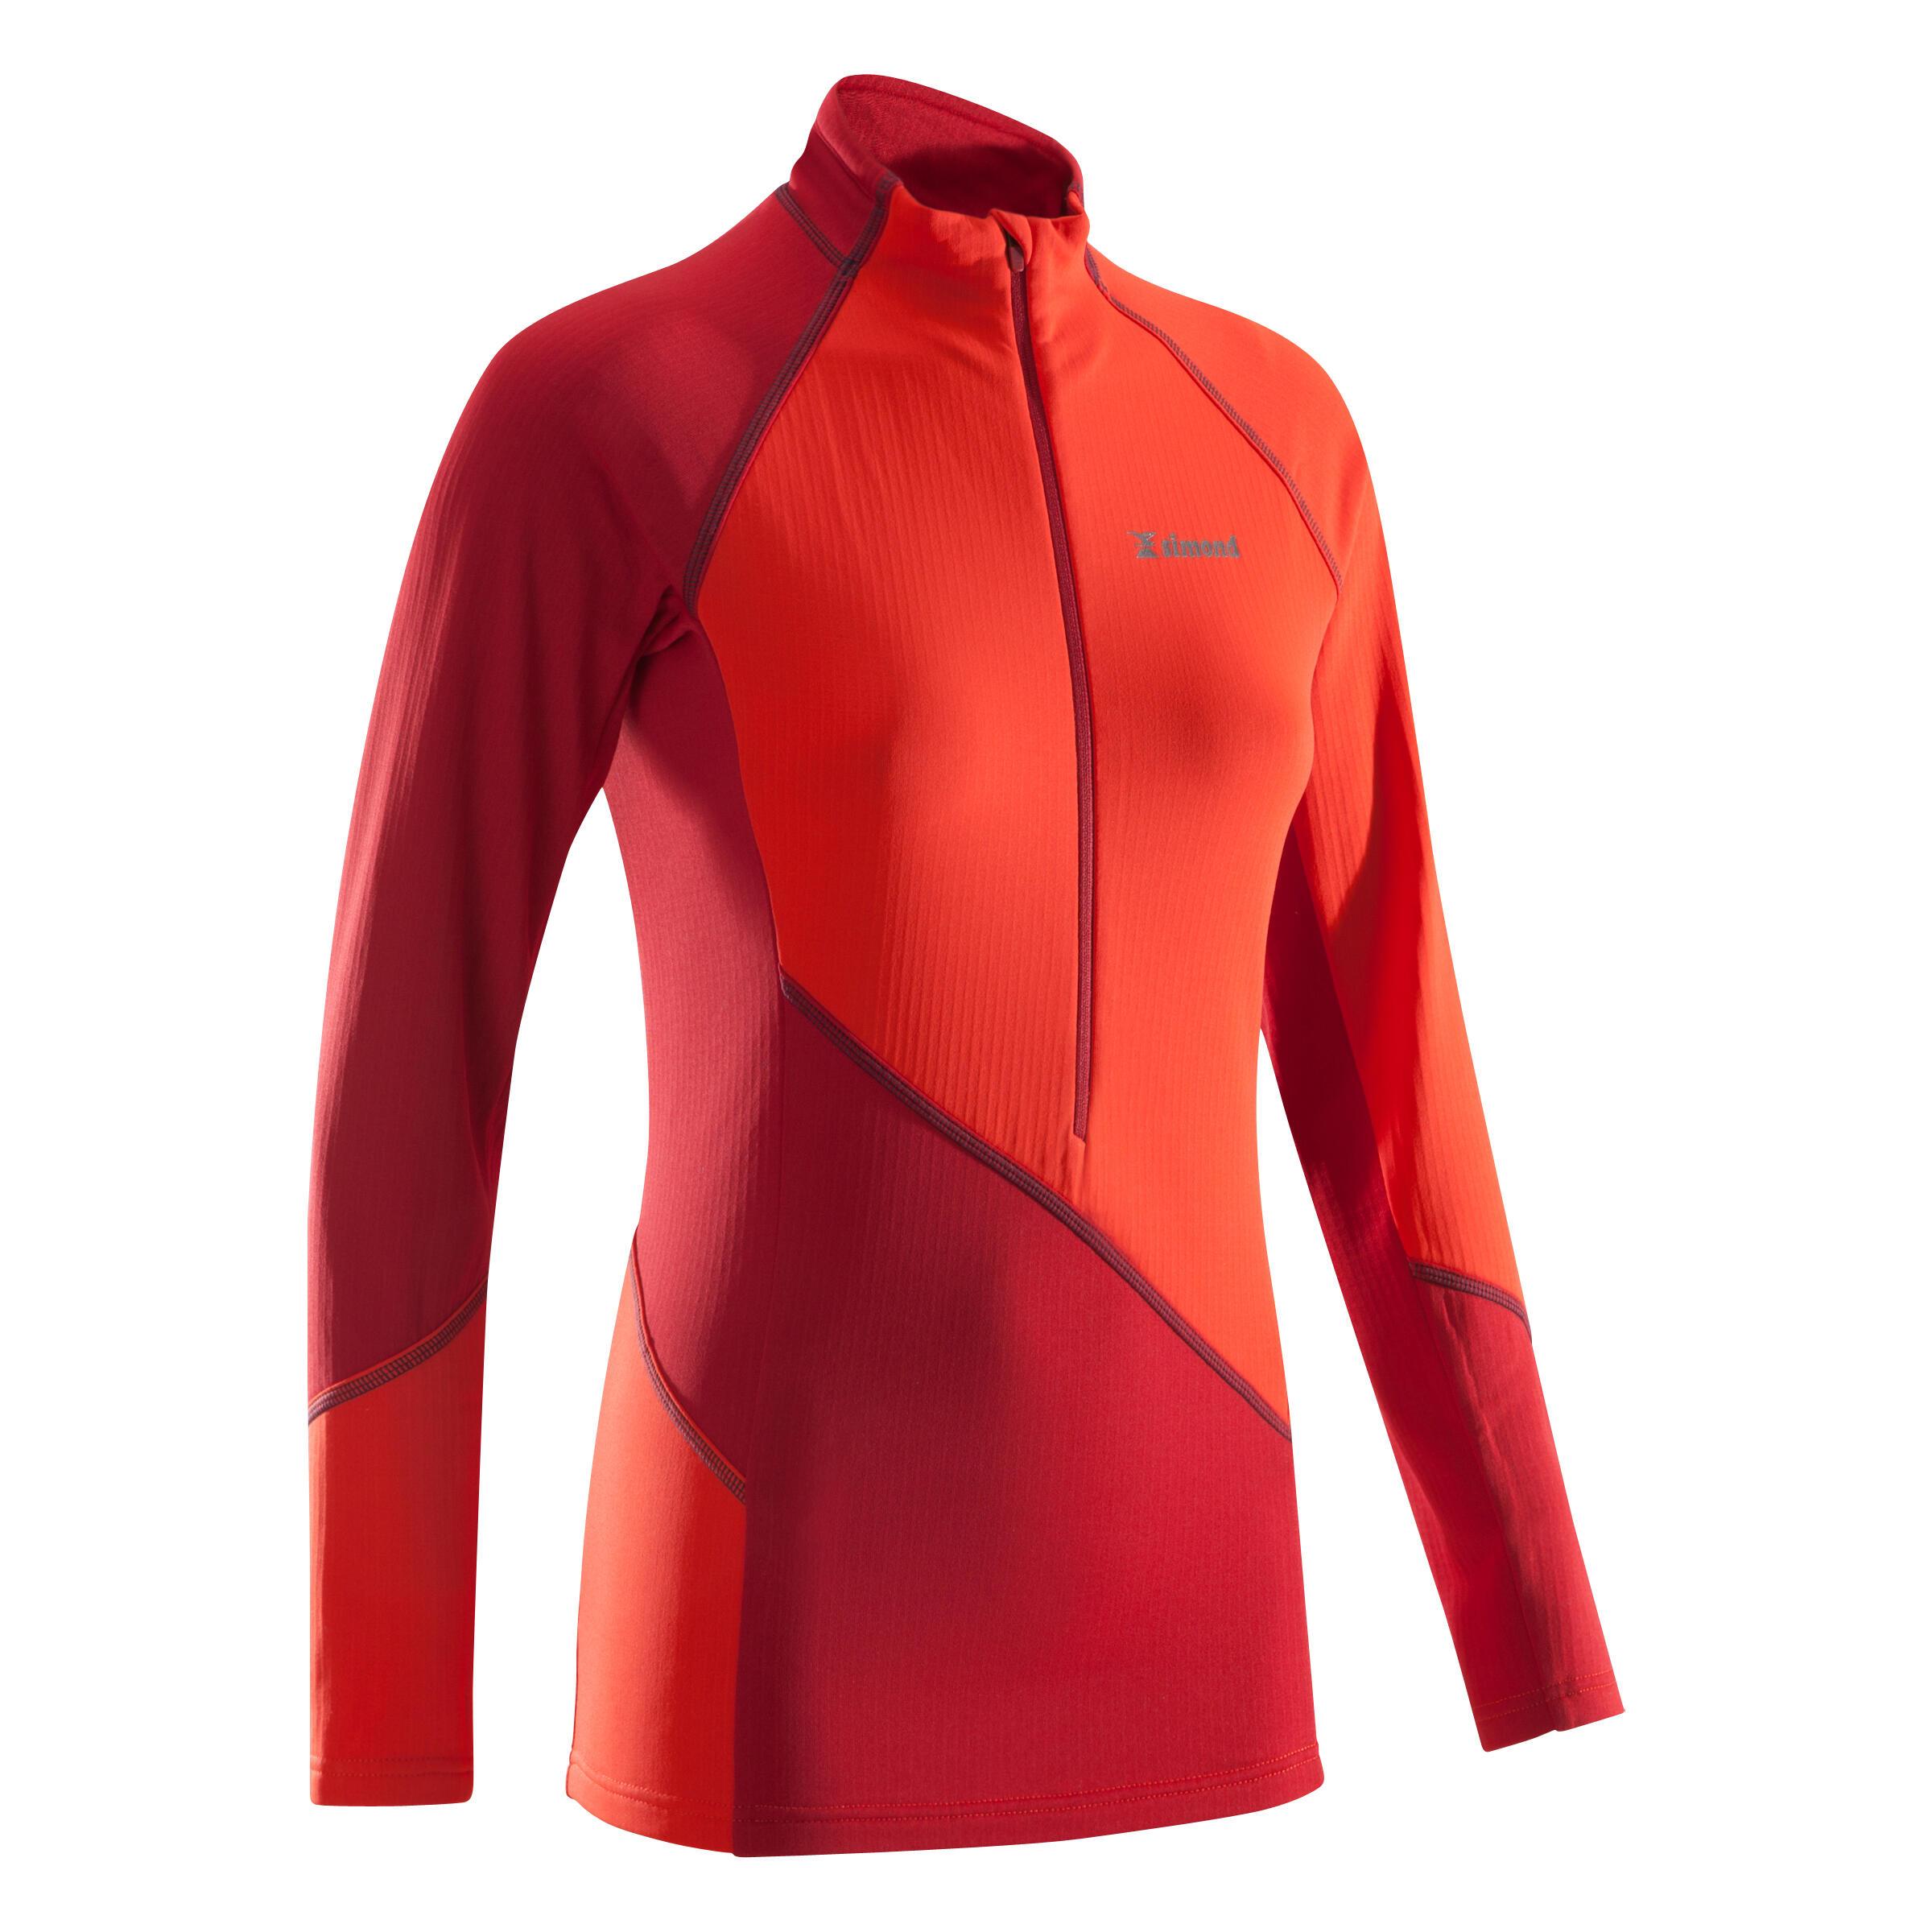 Klettershirt Alpinism 1/2 Zip Damen rot/zinnoberrot | Sportbekleidung > Sportshirts > Klettershirts | Rot - Orange - Bordeaux | Fleece | Simond